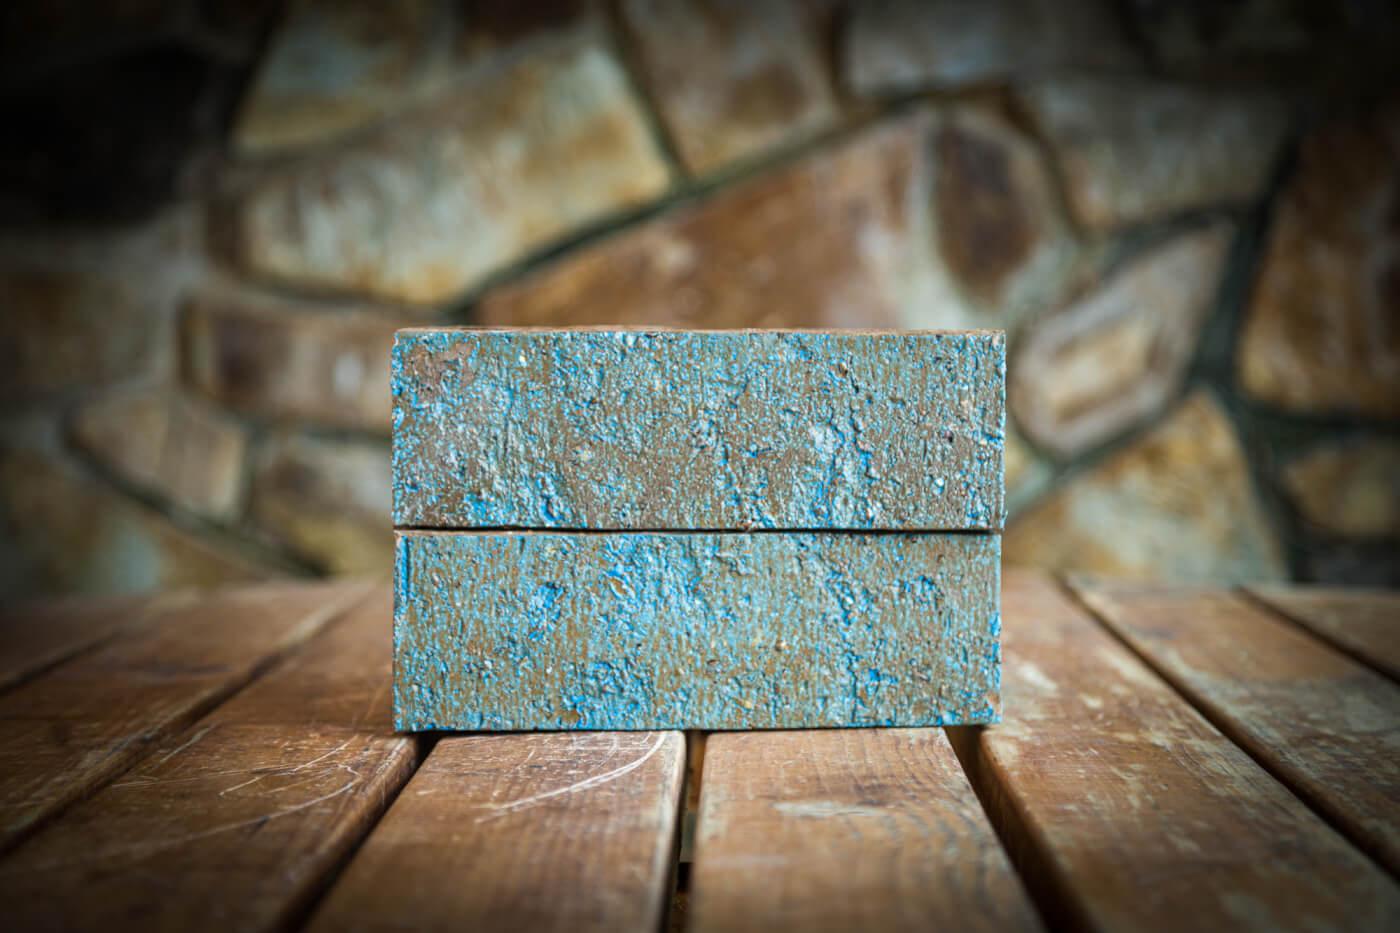 Caspian Light Blue Glazed Brick By Littlehampton Bricks And Pavers 1